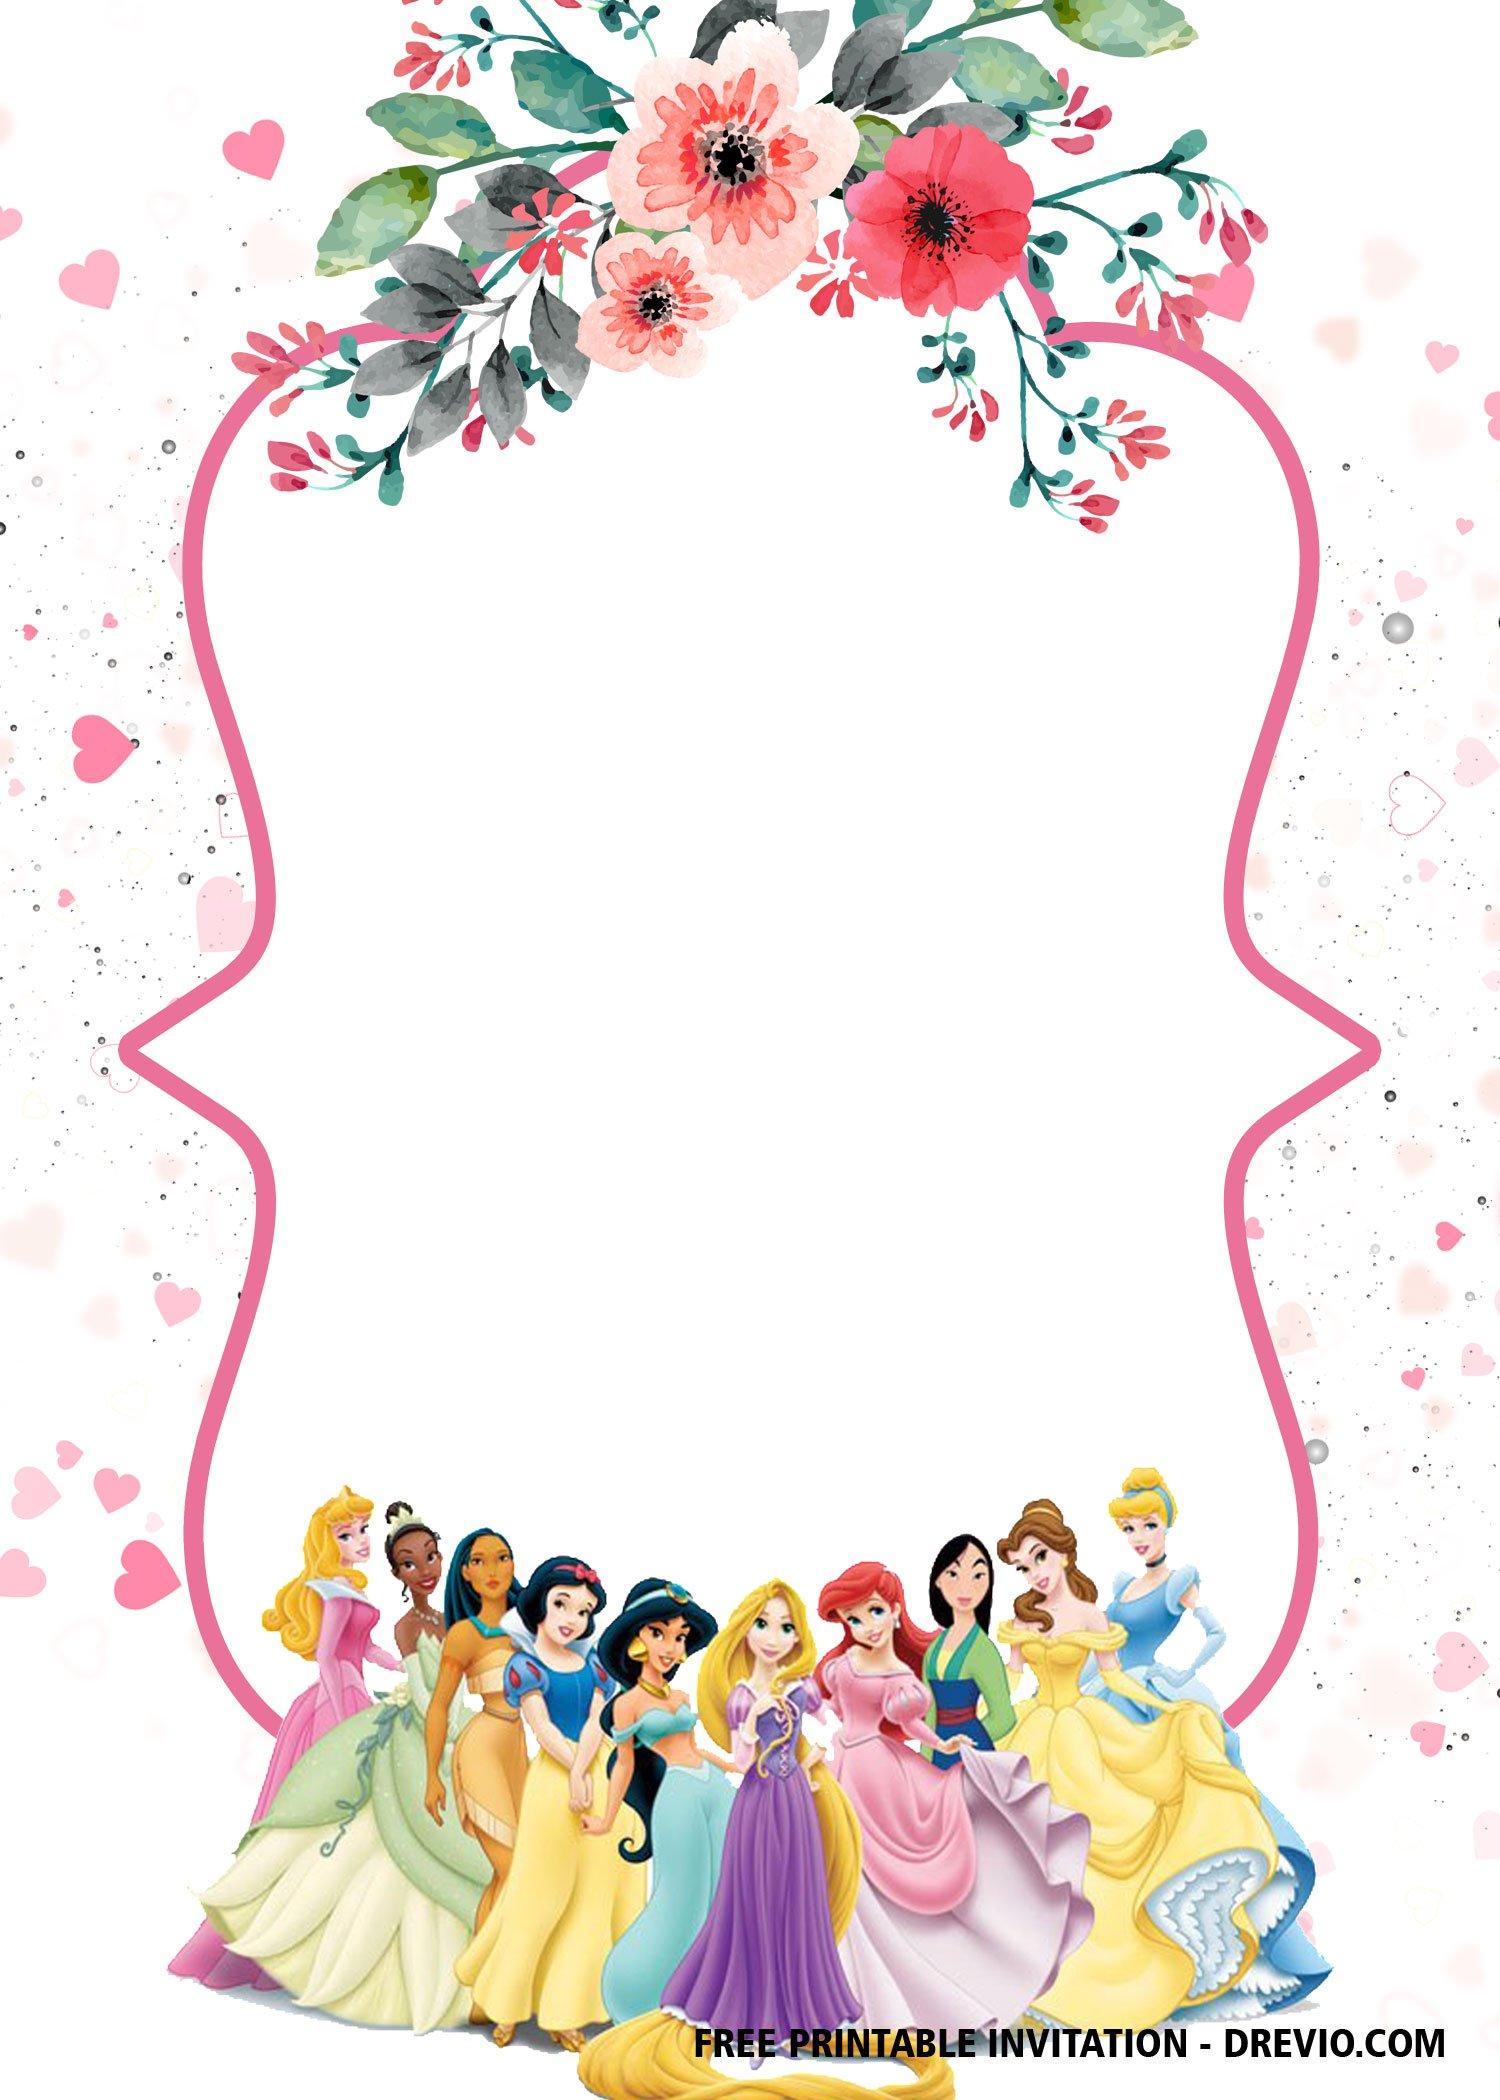 Free Printable Disney Princesses Invitation Templates Bagvania